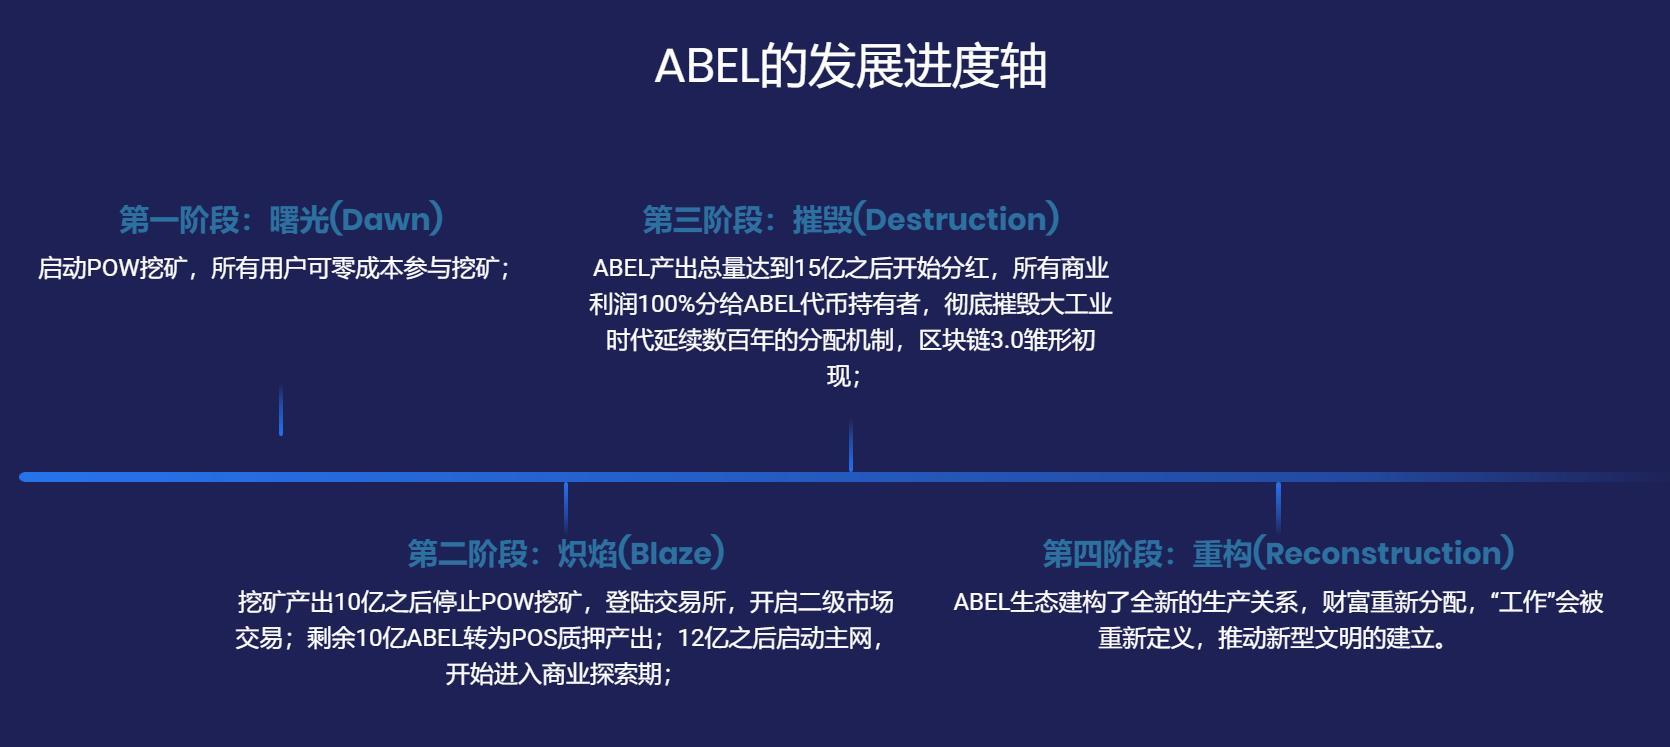 abel的发展进度轴